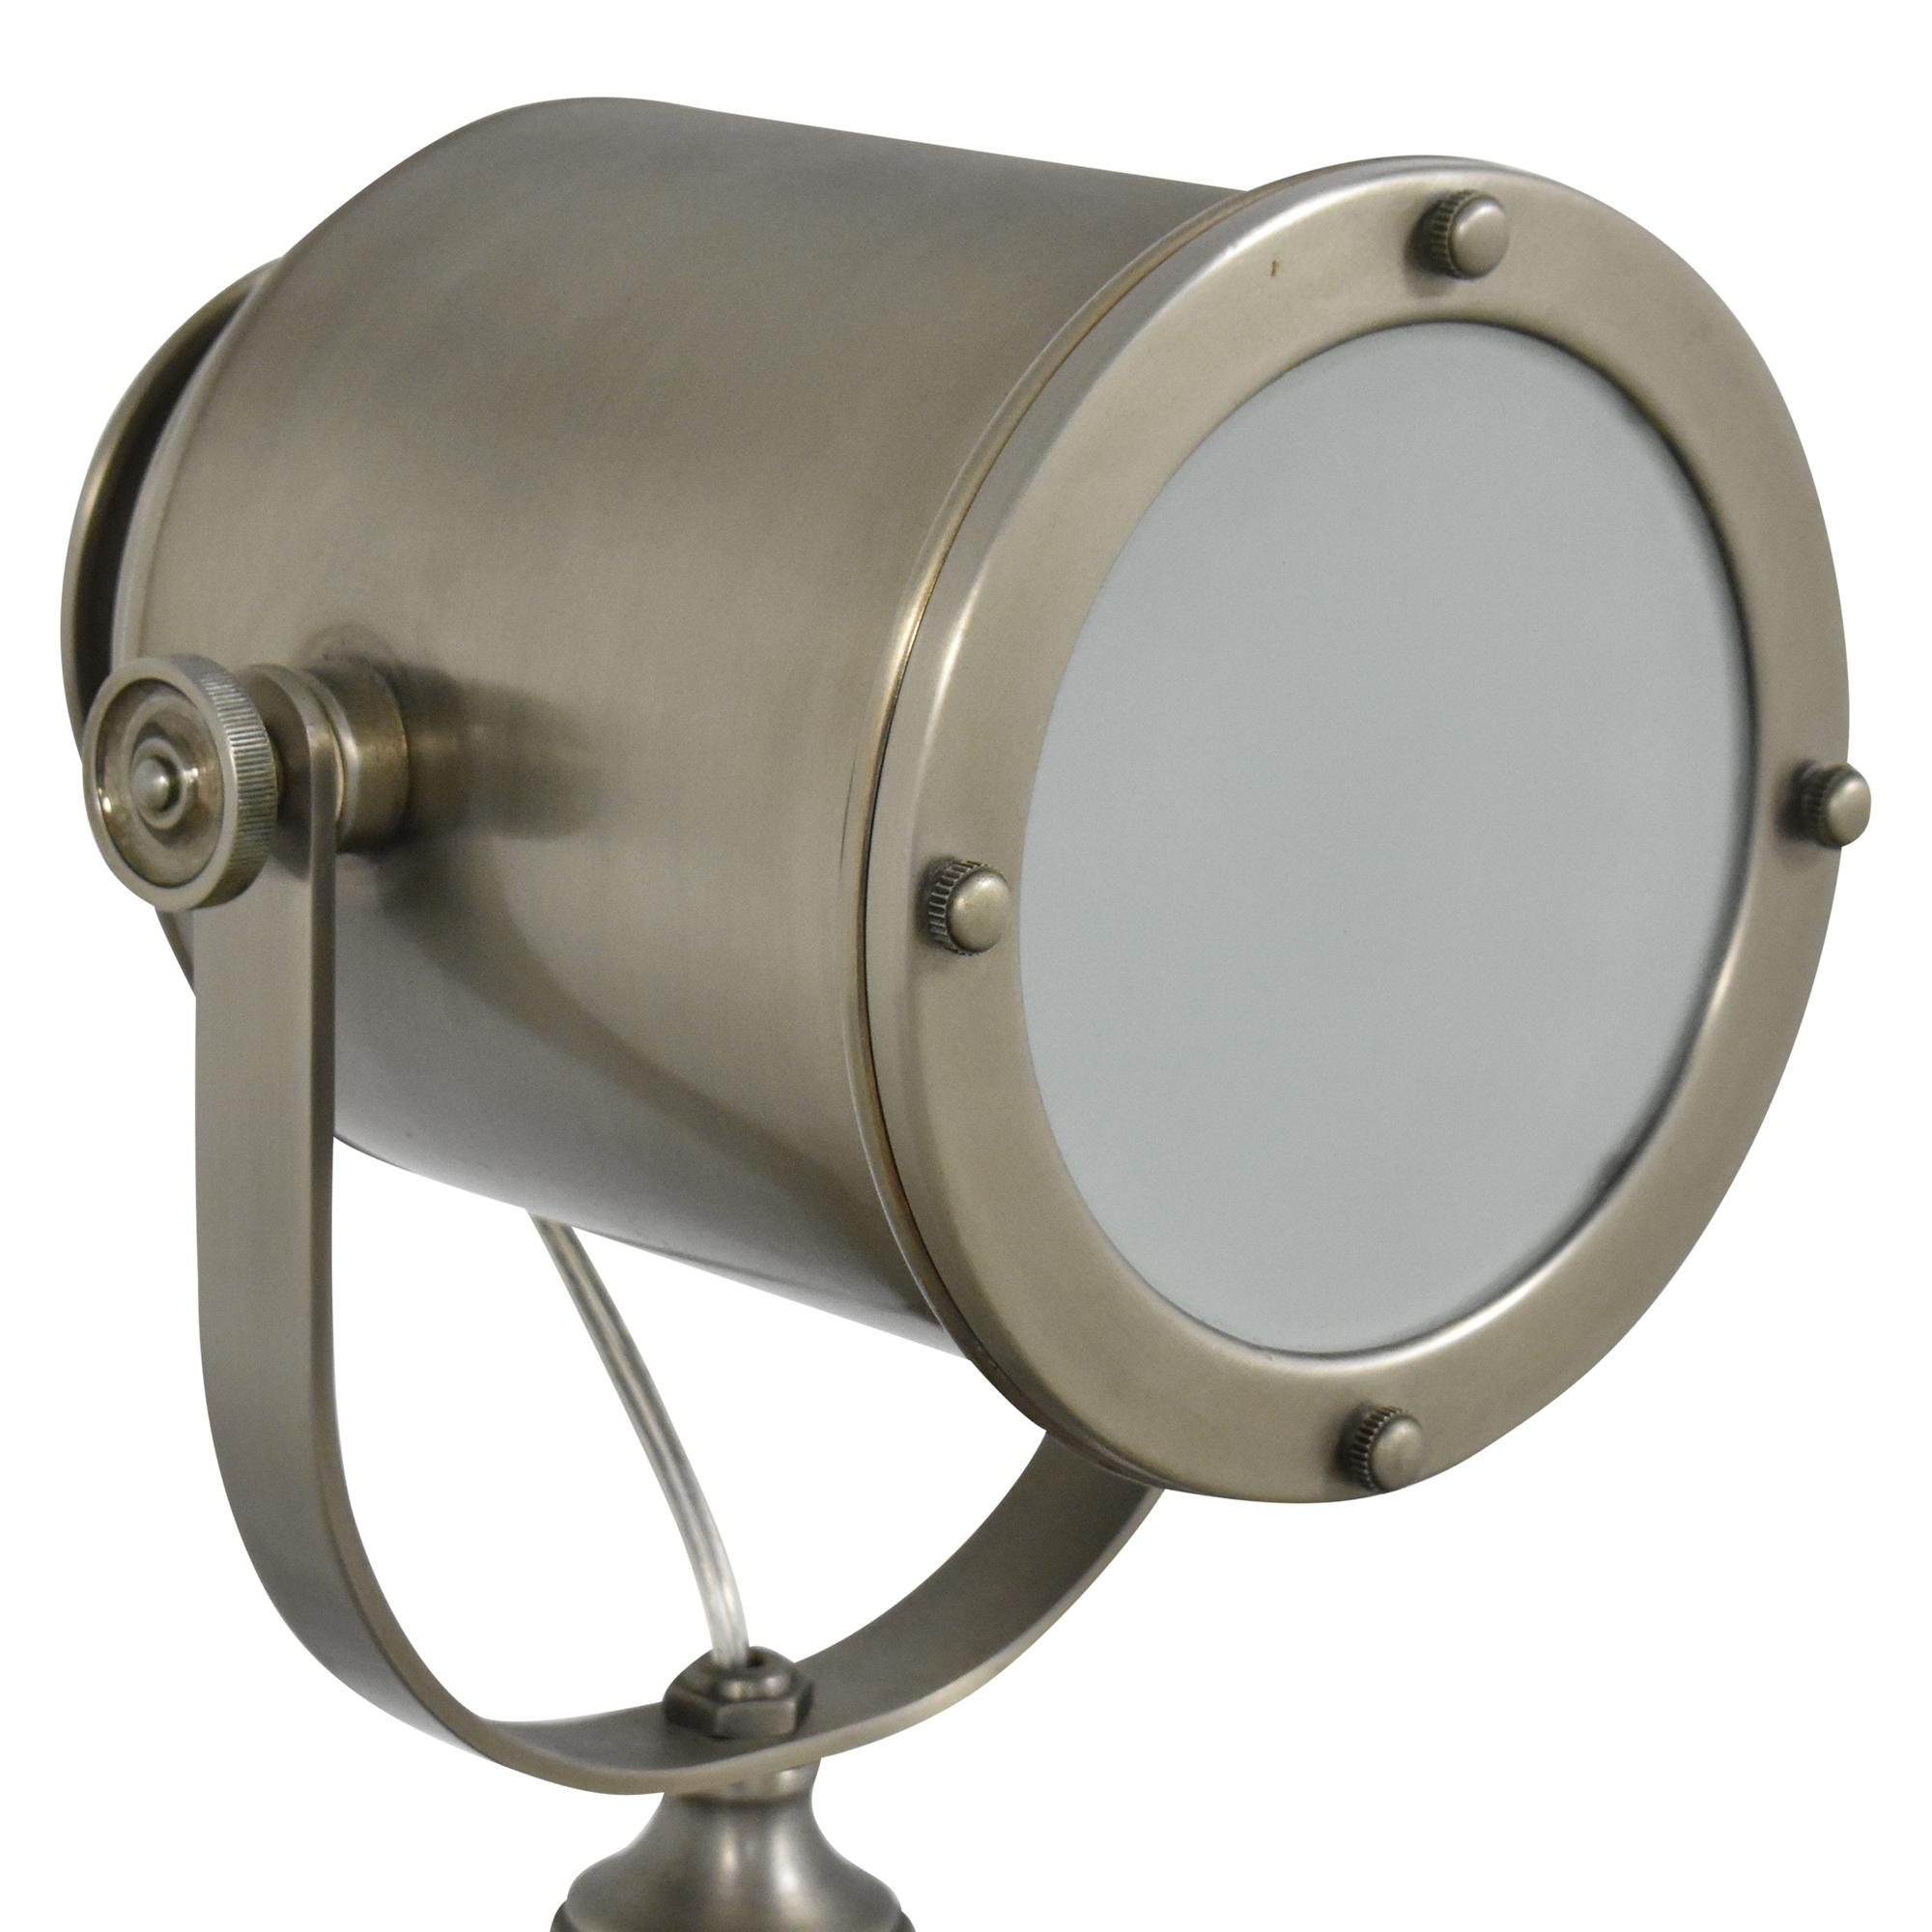 Pottery Barn Pottery Barn Photographer's Adjustable Tripod Floor Lamp nyc